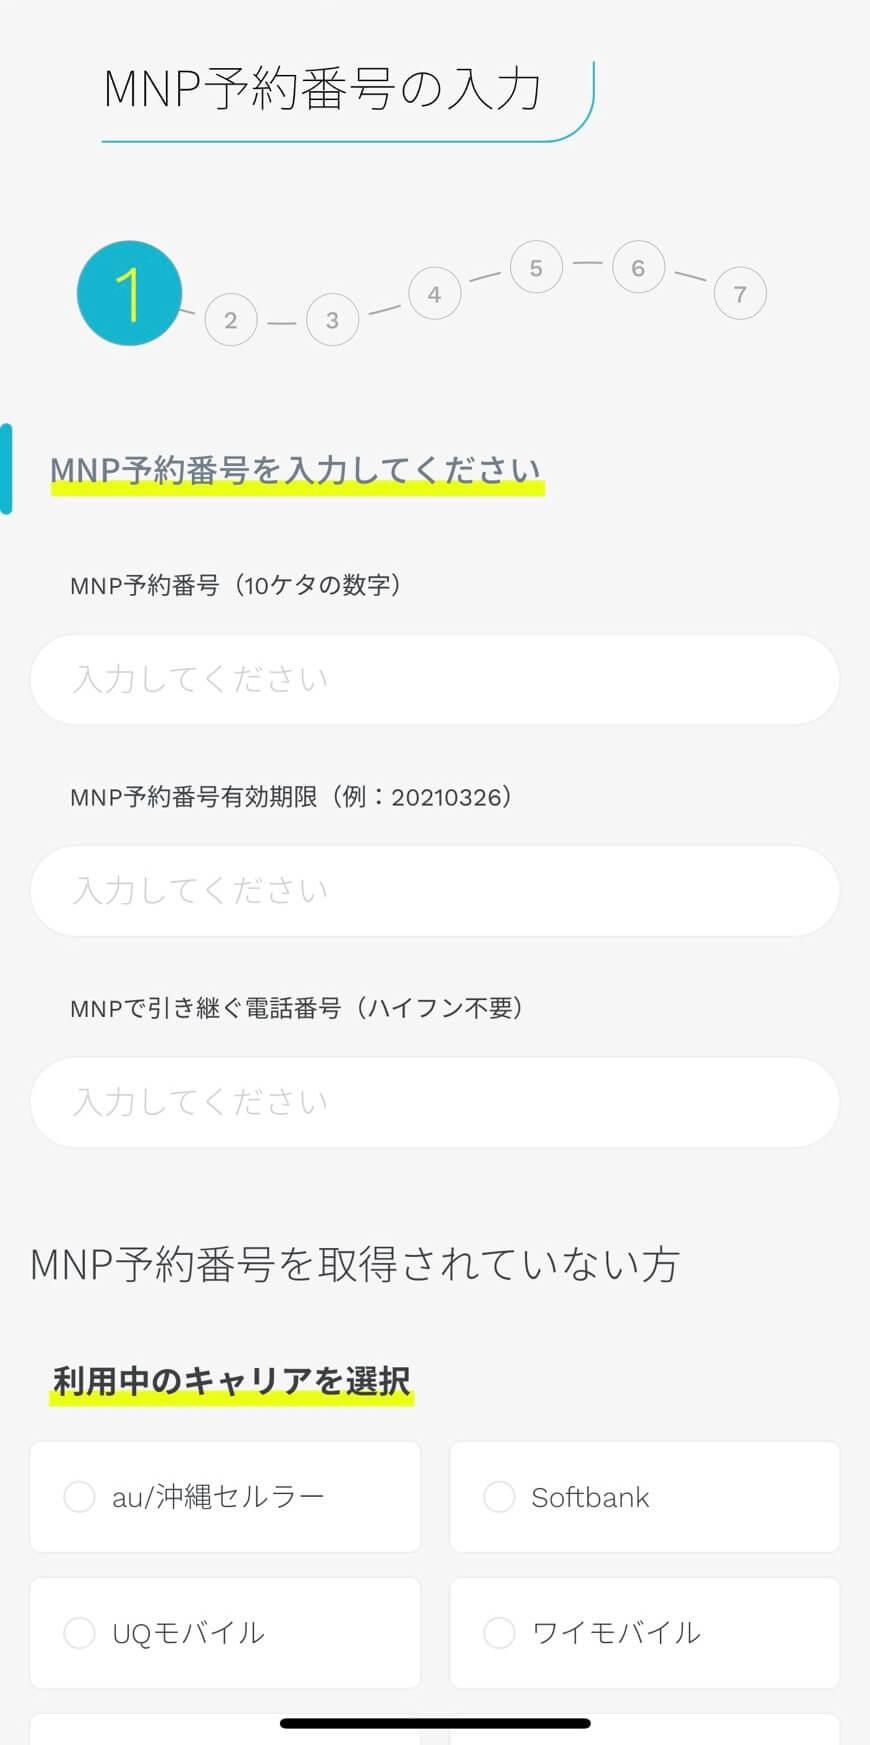 MNP予約番号の入力